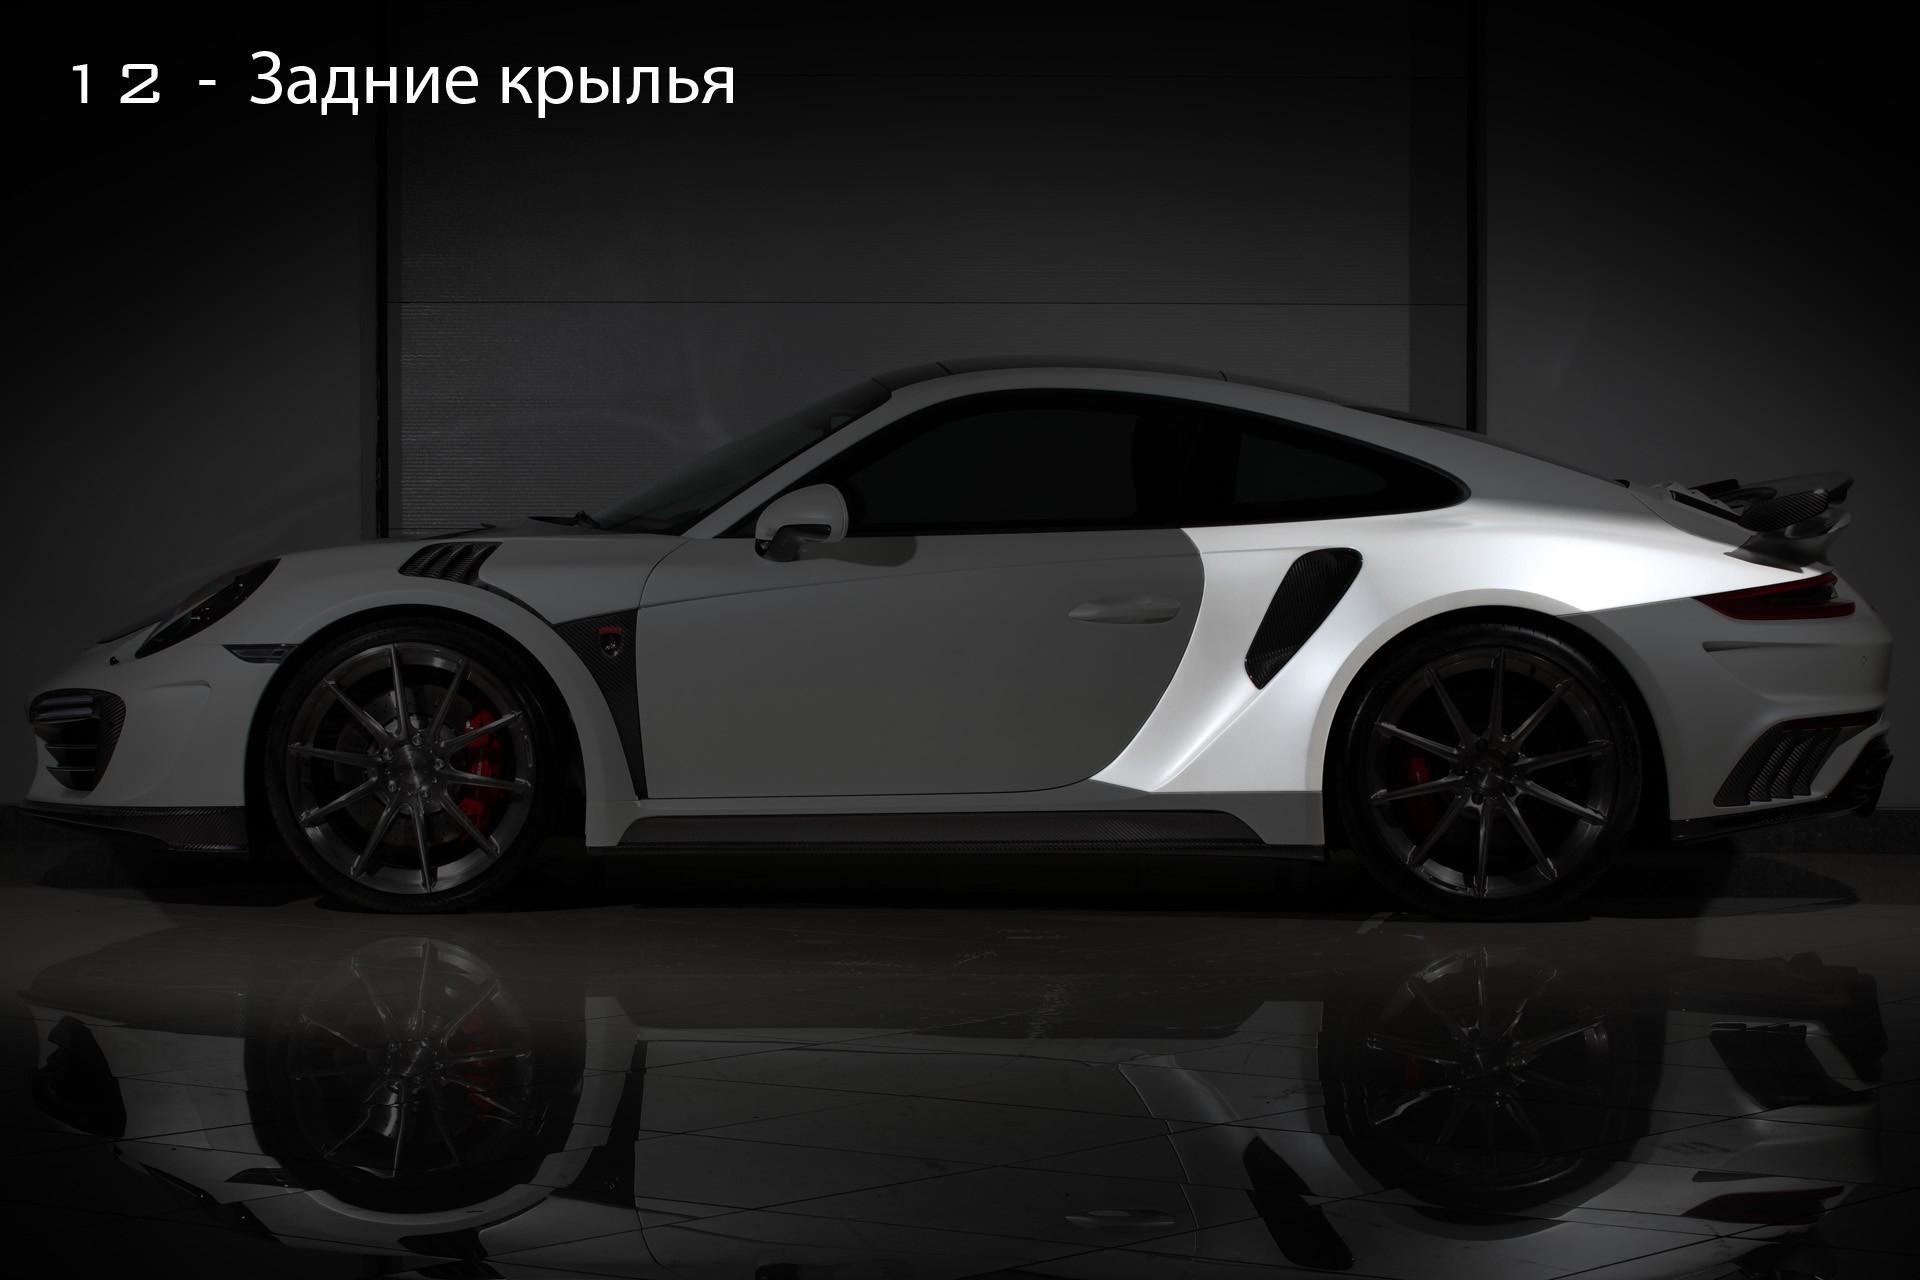 Обвес Topcar Design для Porsche 991 Stinger GTR gen.2